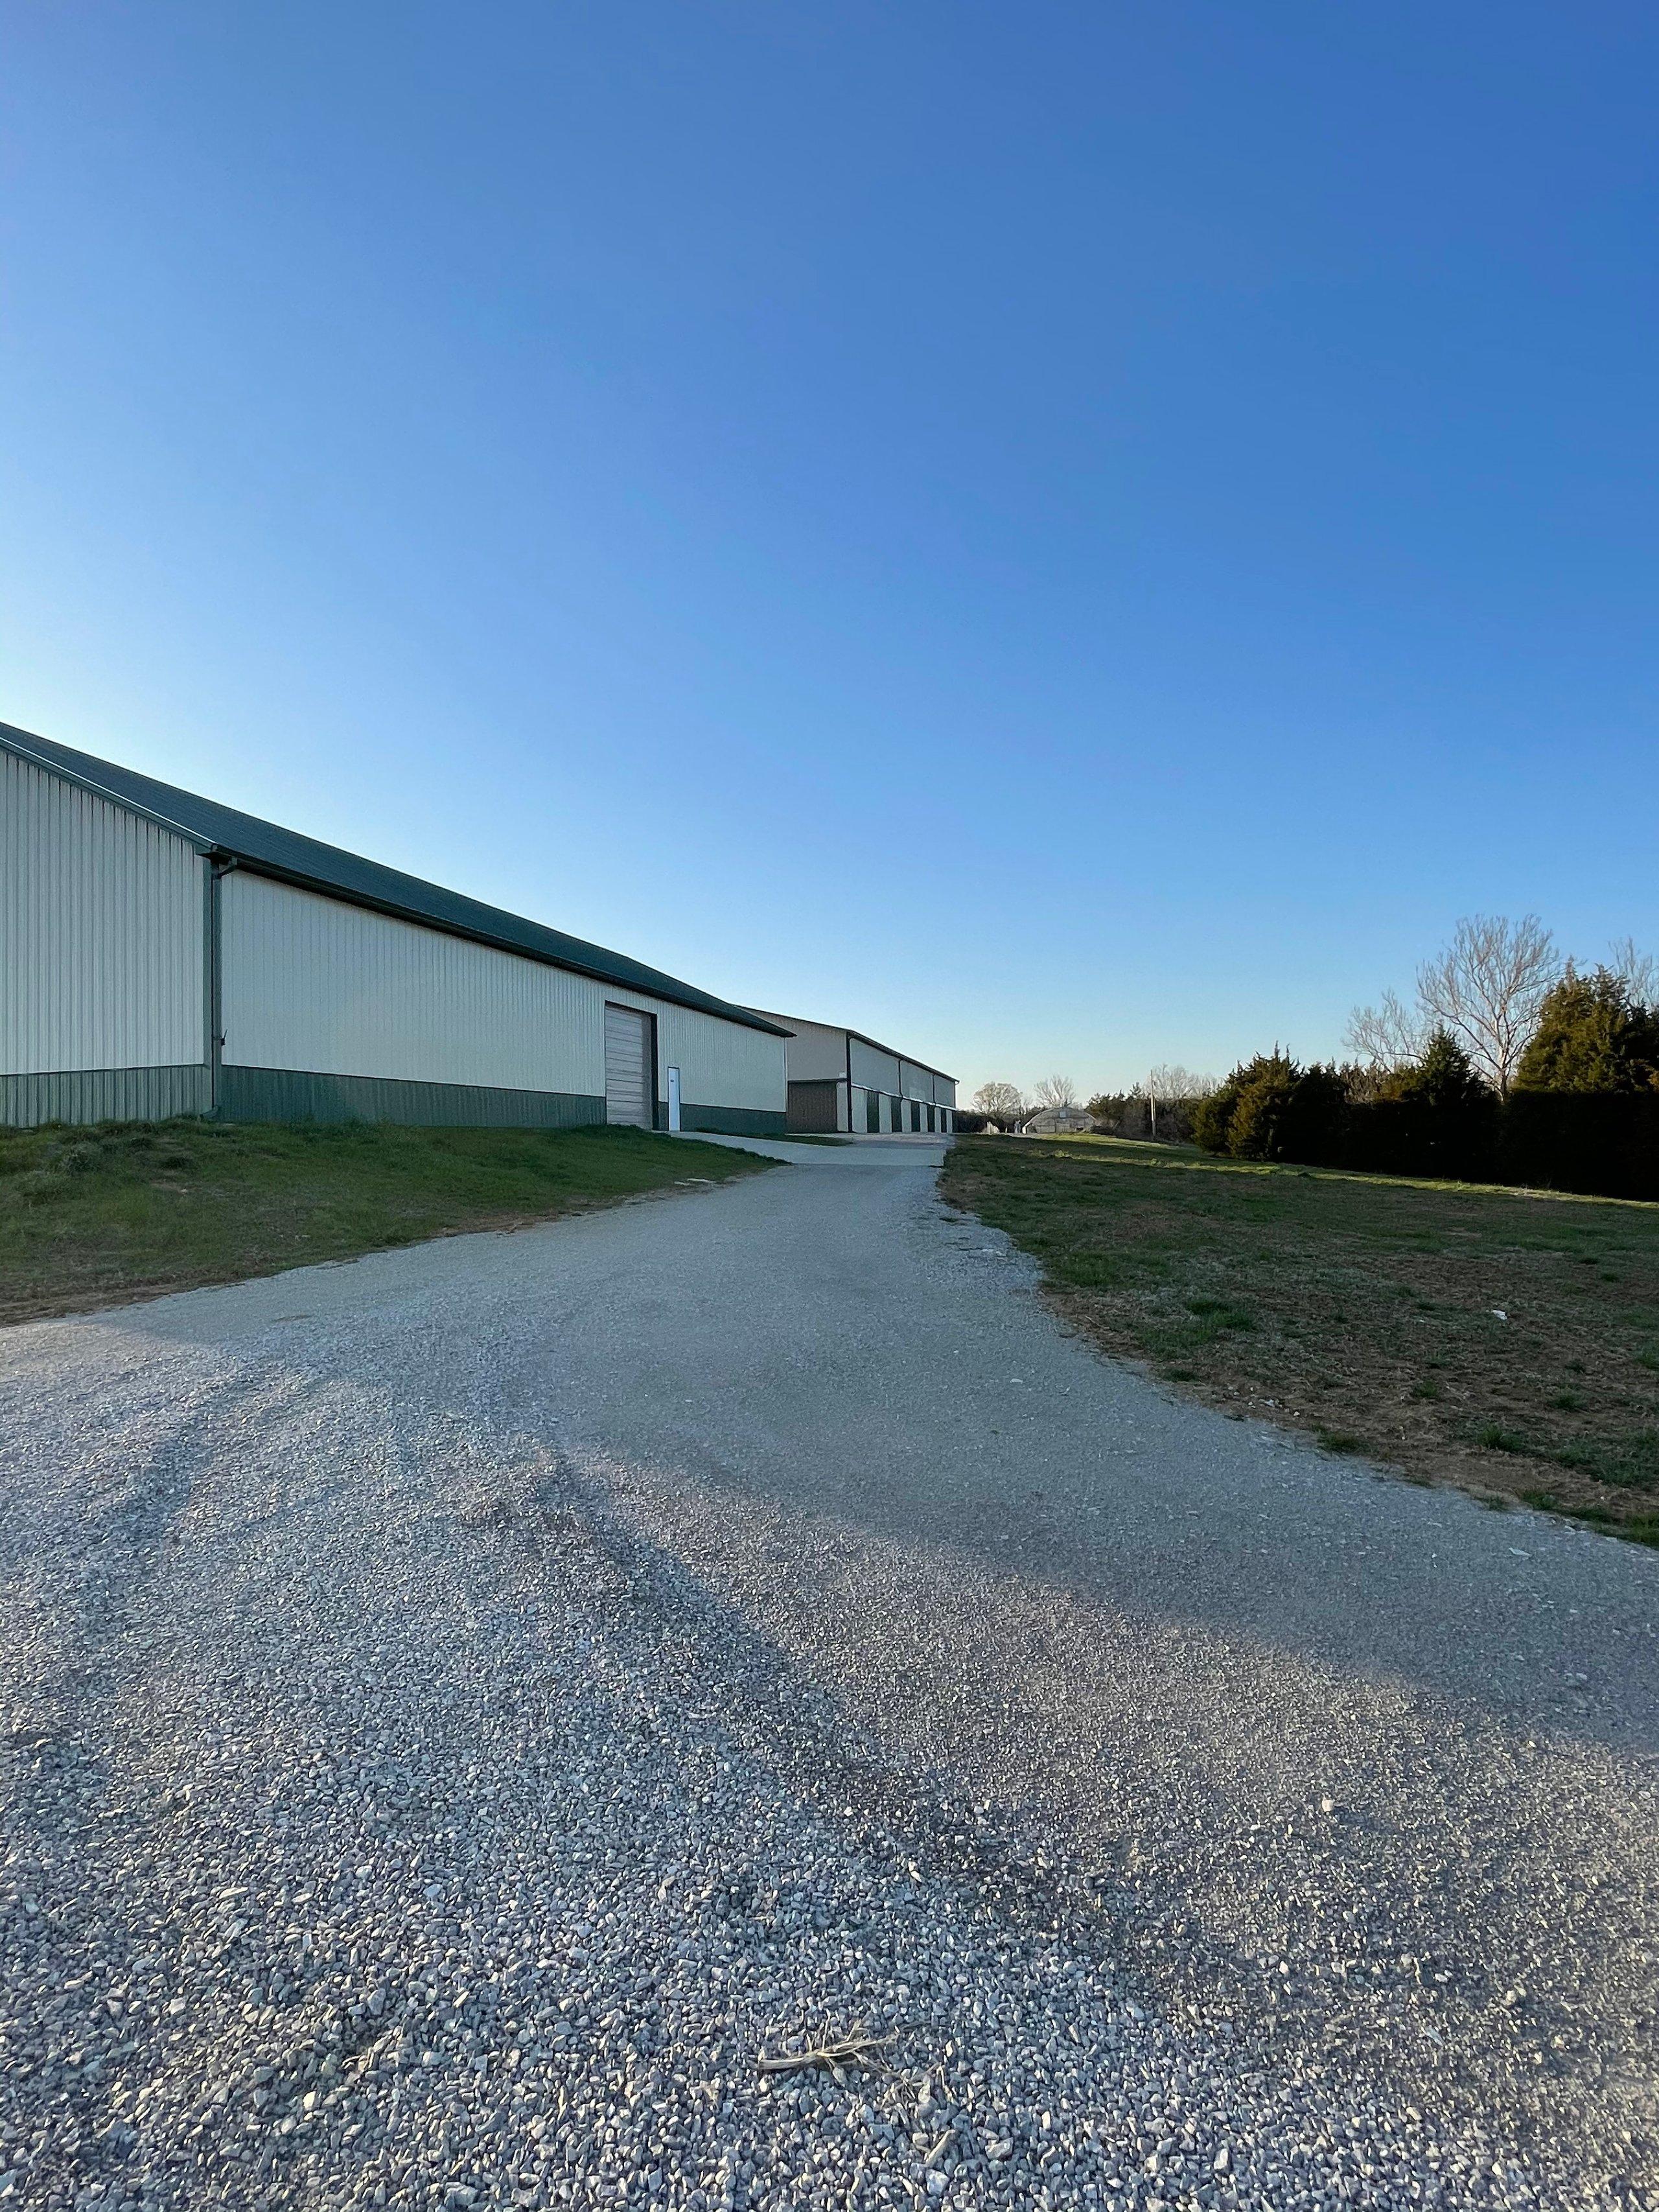 30x15 Warehouse self storage unit